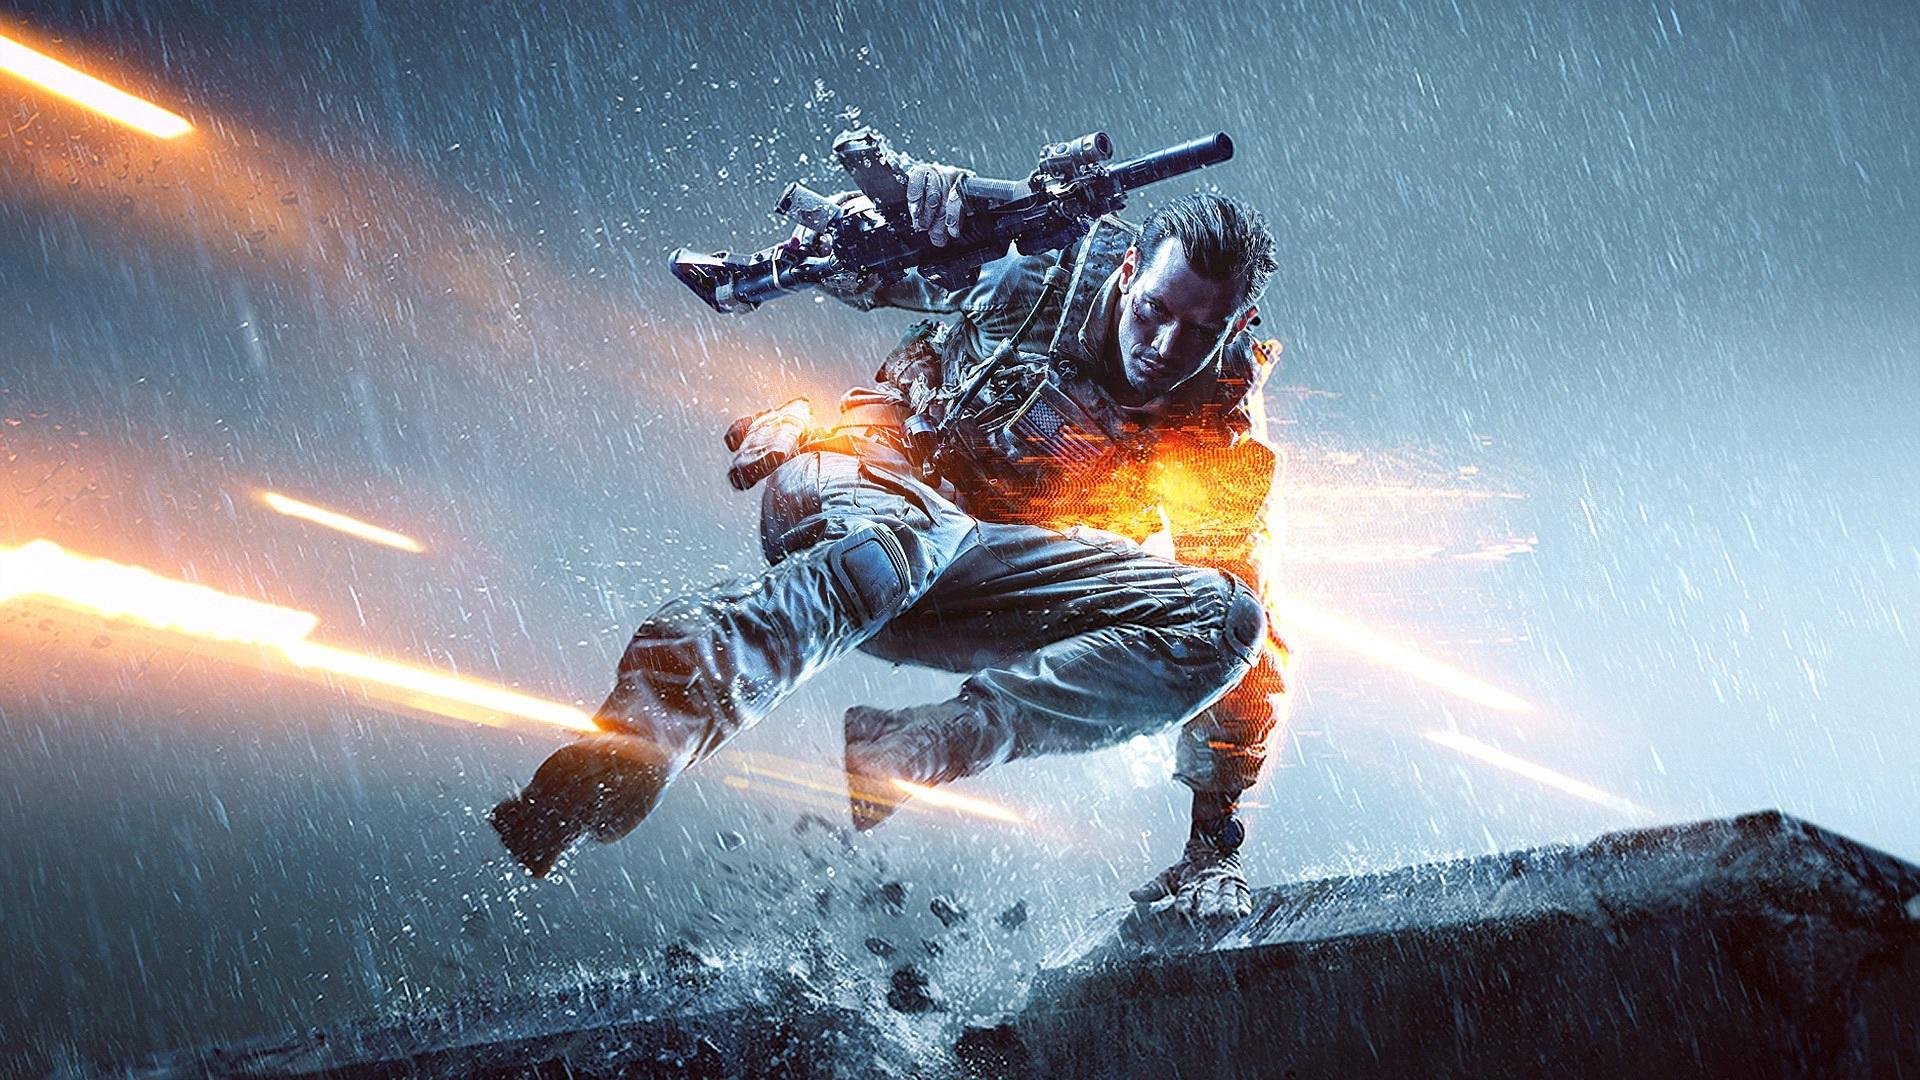 Wallpaper Battlefield 4 Rain Soldier Gun 1920x1080 Full Hd 2k